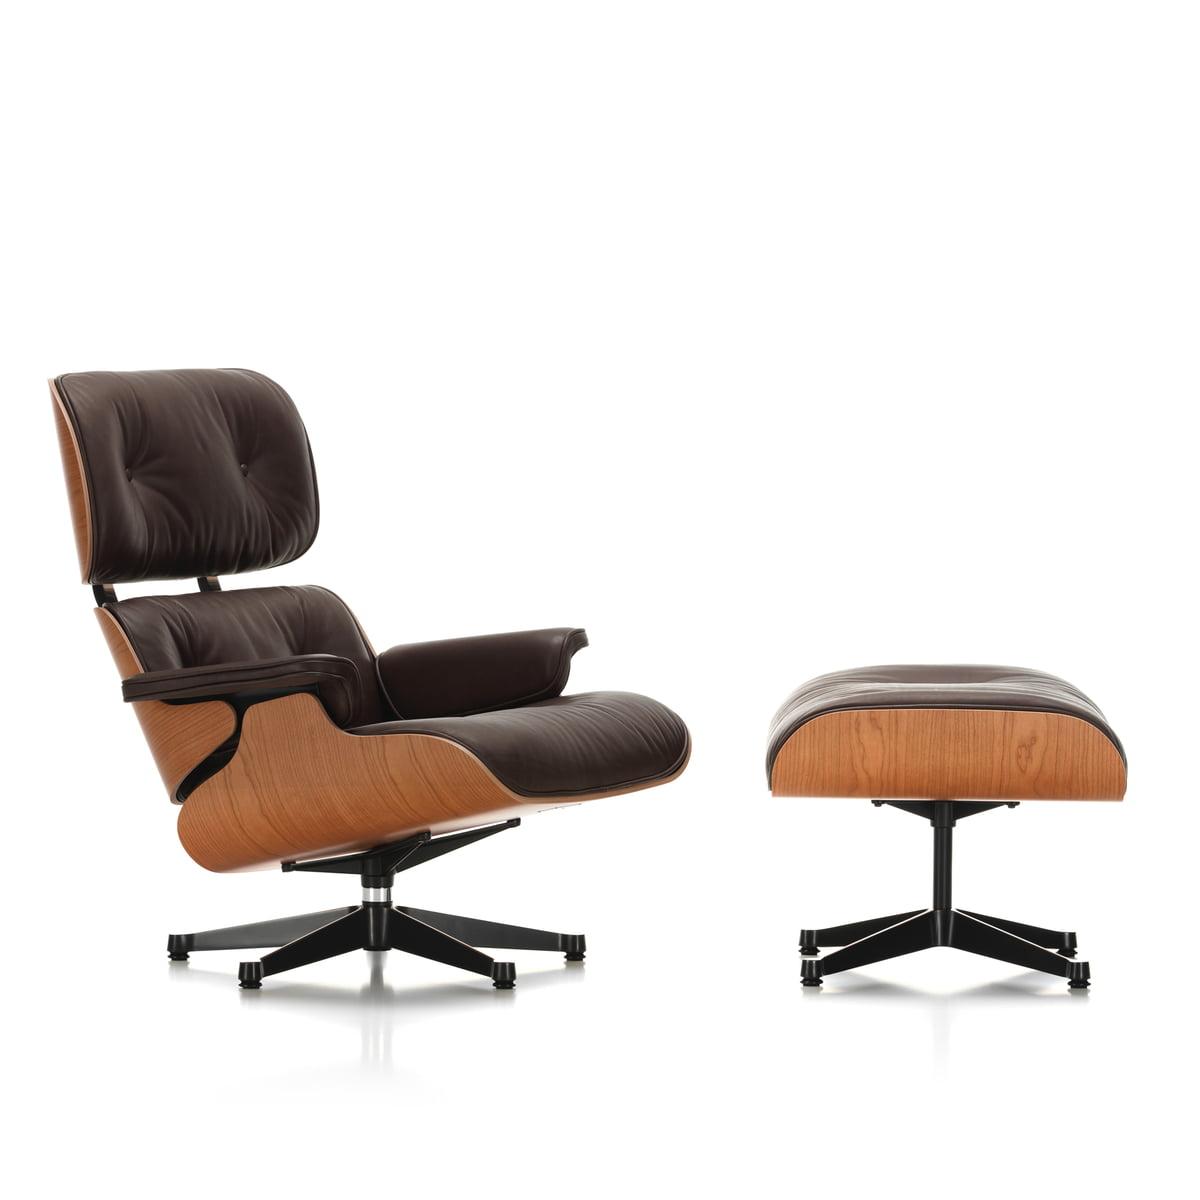 vitra lounge chair ottoman kirschbaum. Black Bedroom Furniture Sets. Home Design Ideas